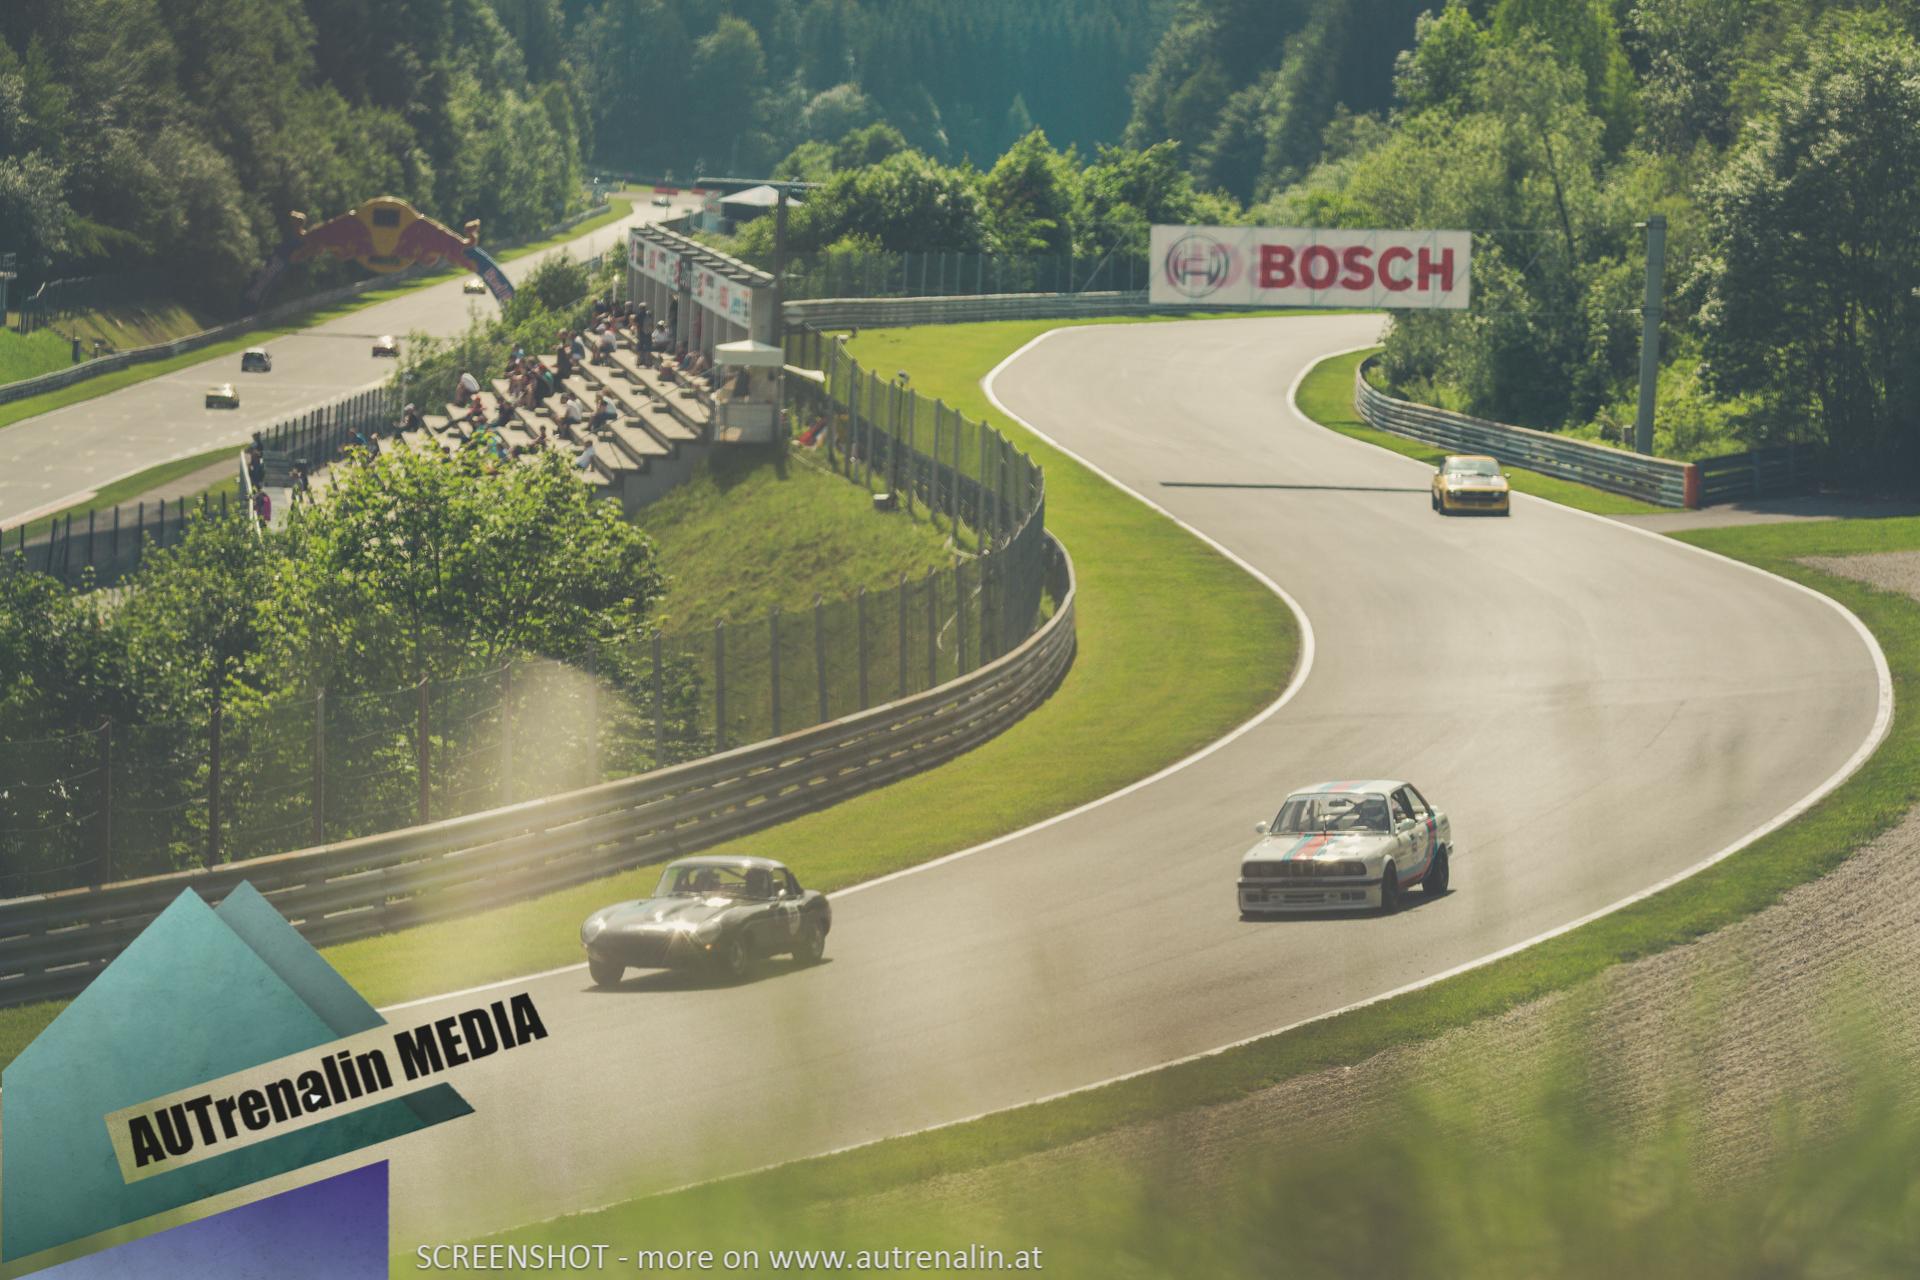 SportwagenCup_Salzburgring-Mai-2018_AUTrenalinMEDIA_web-6441.jpg